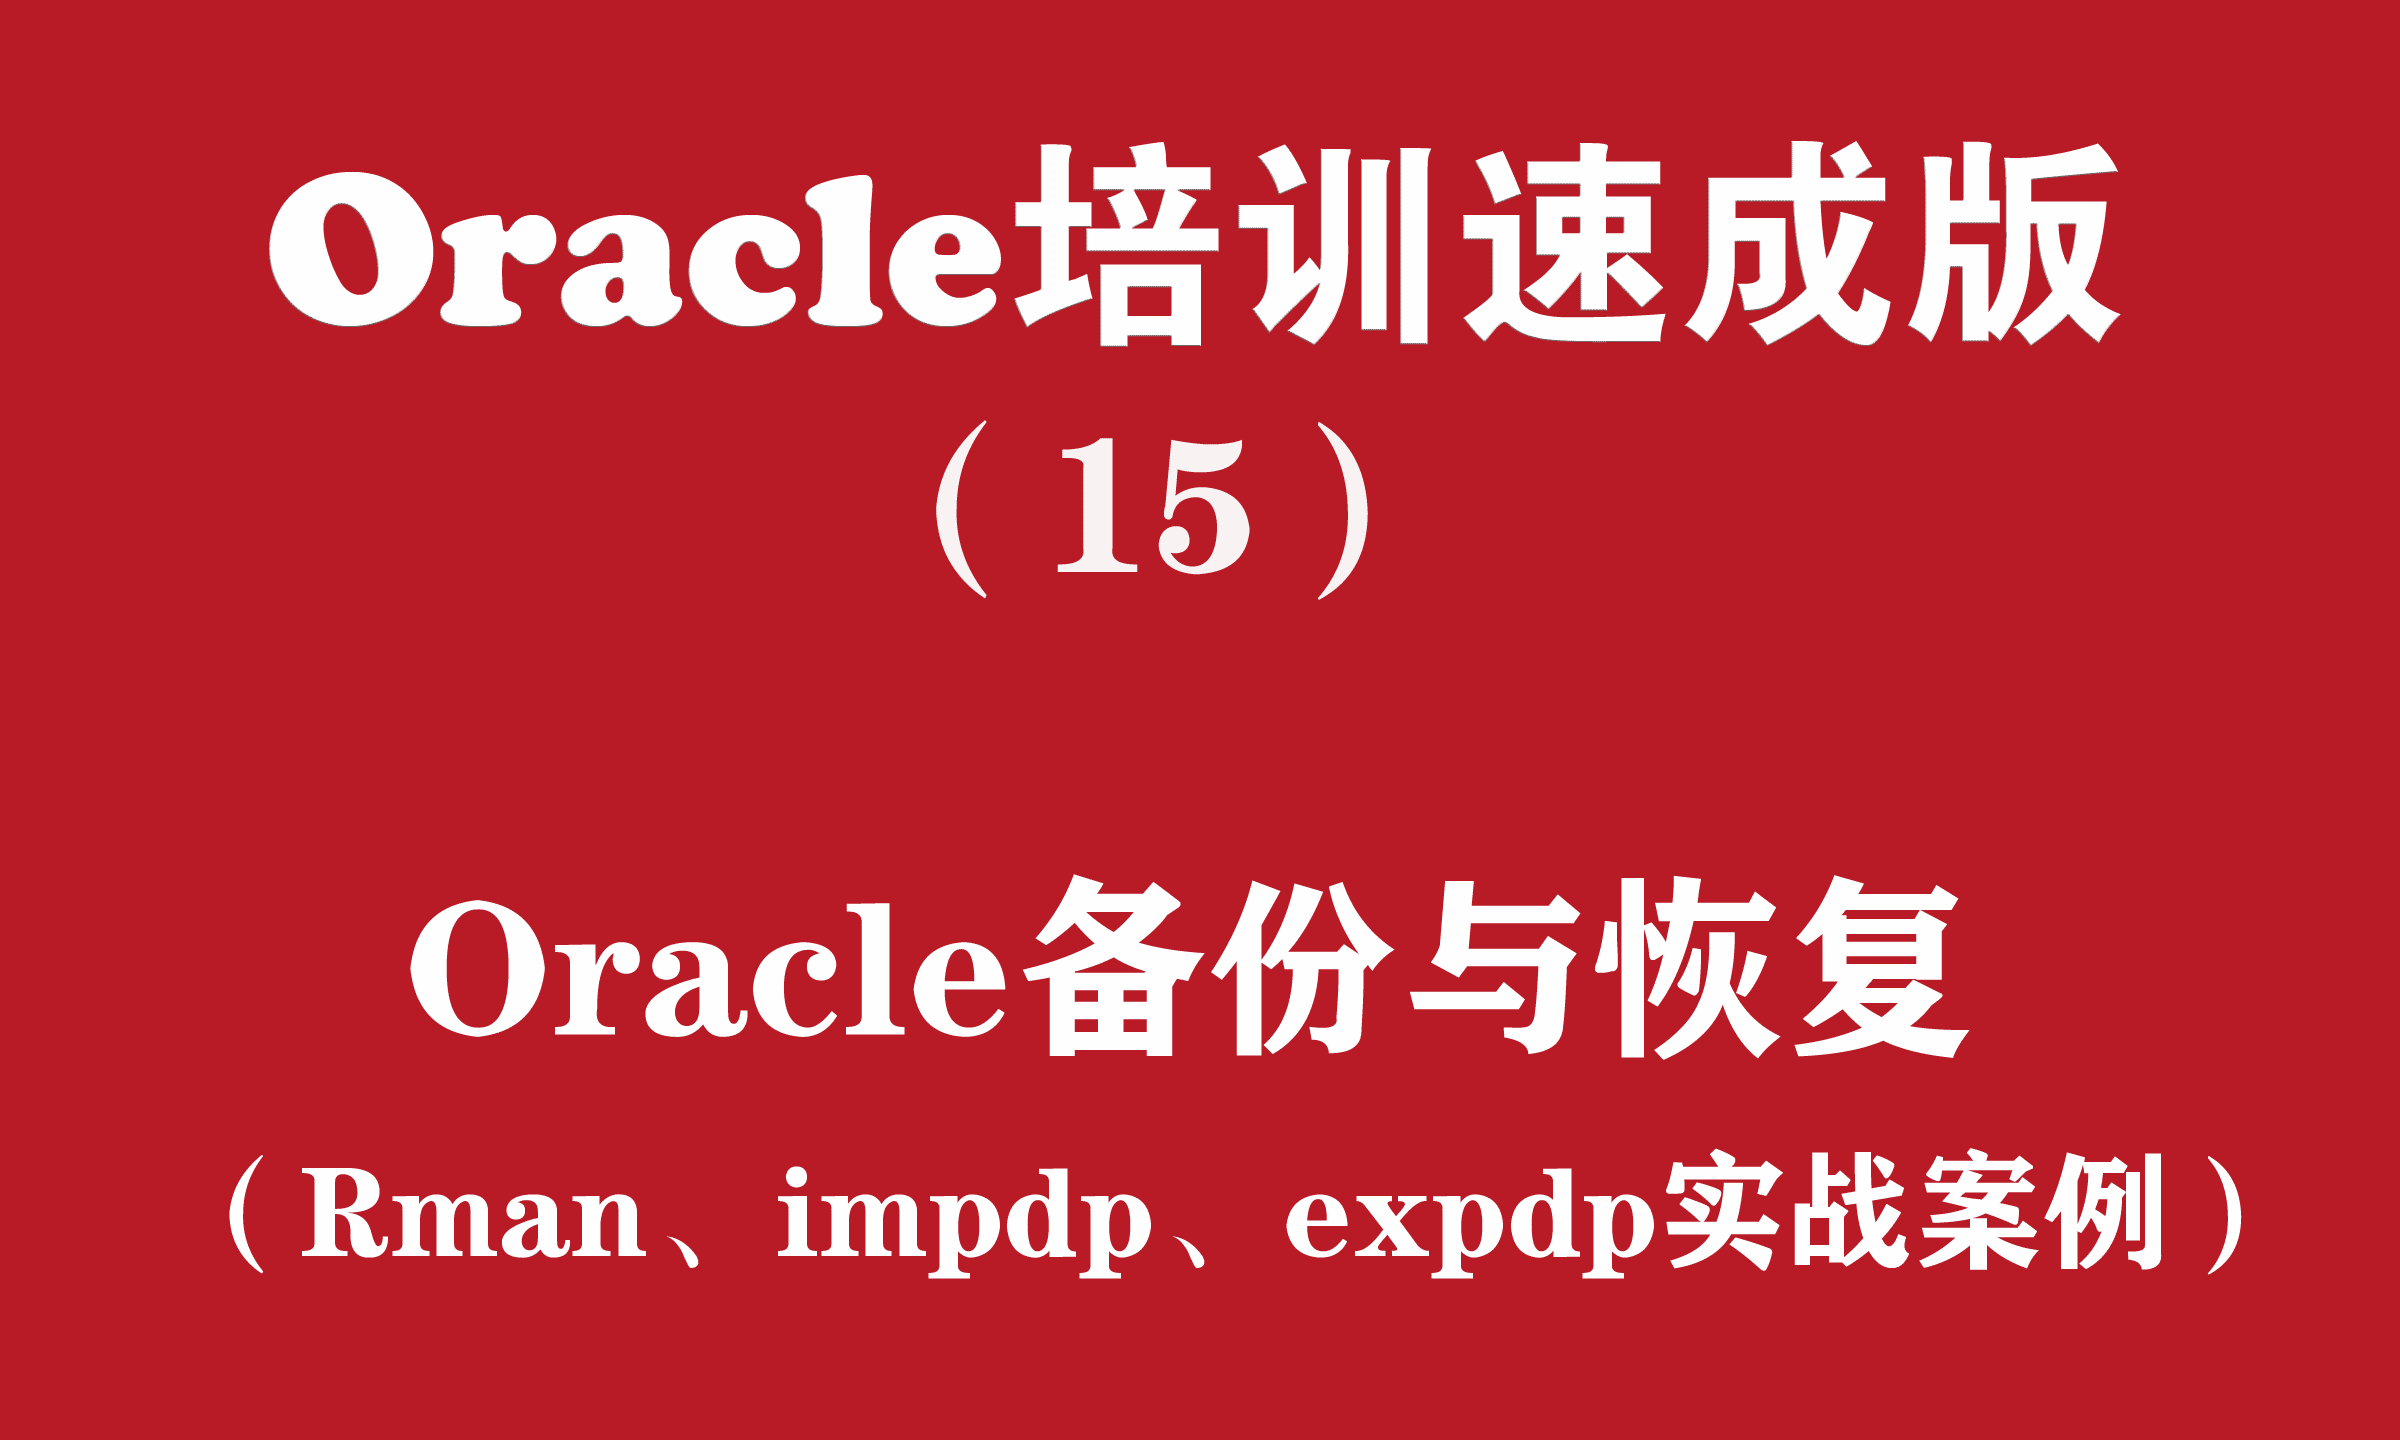 Oracle入门培训教程(15):Oracle备份恢复